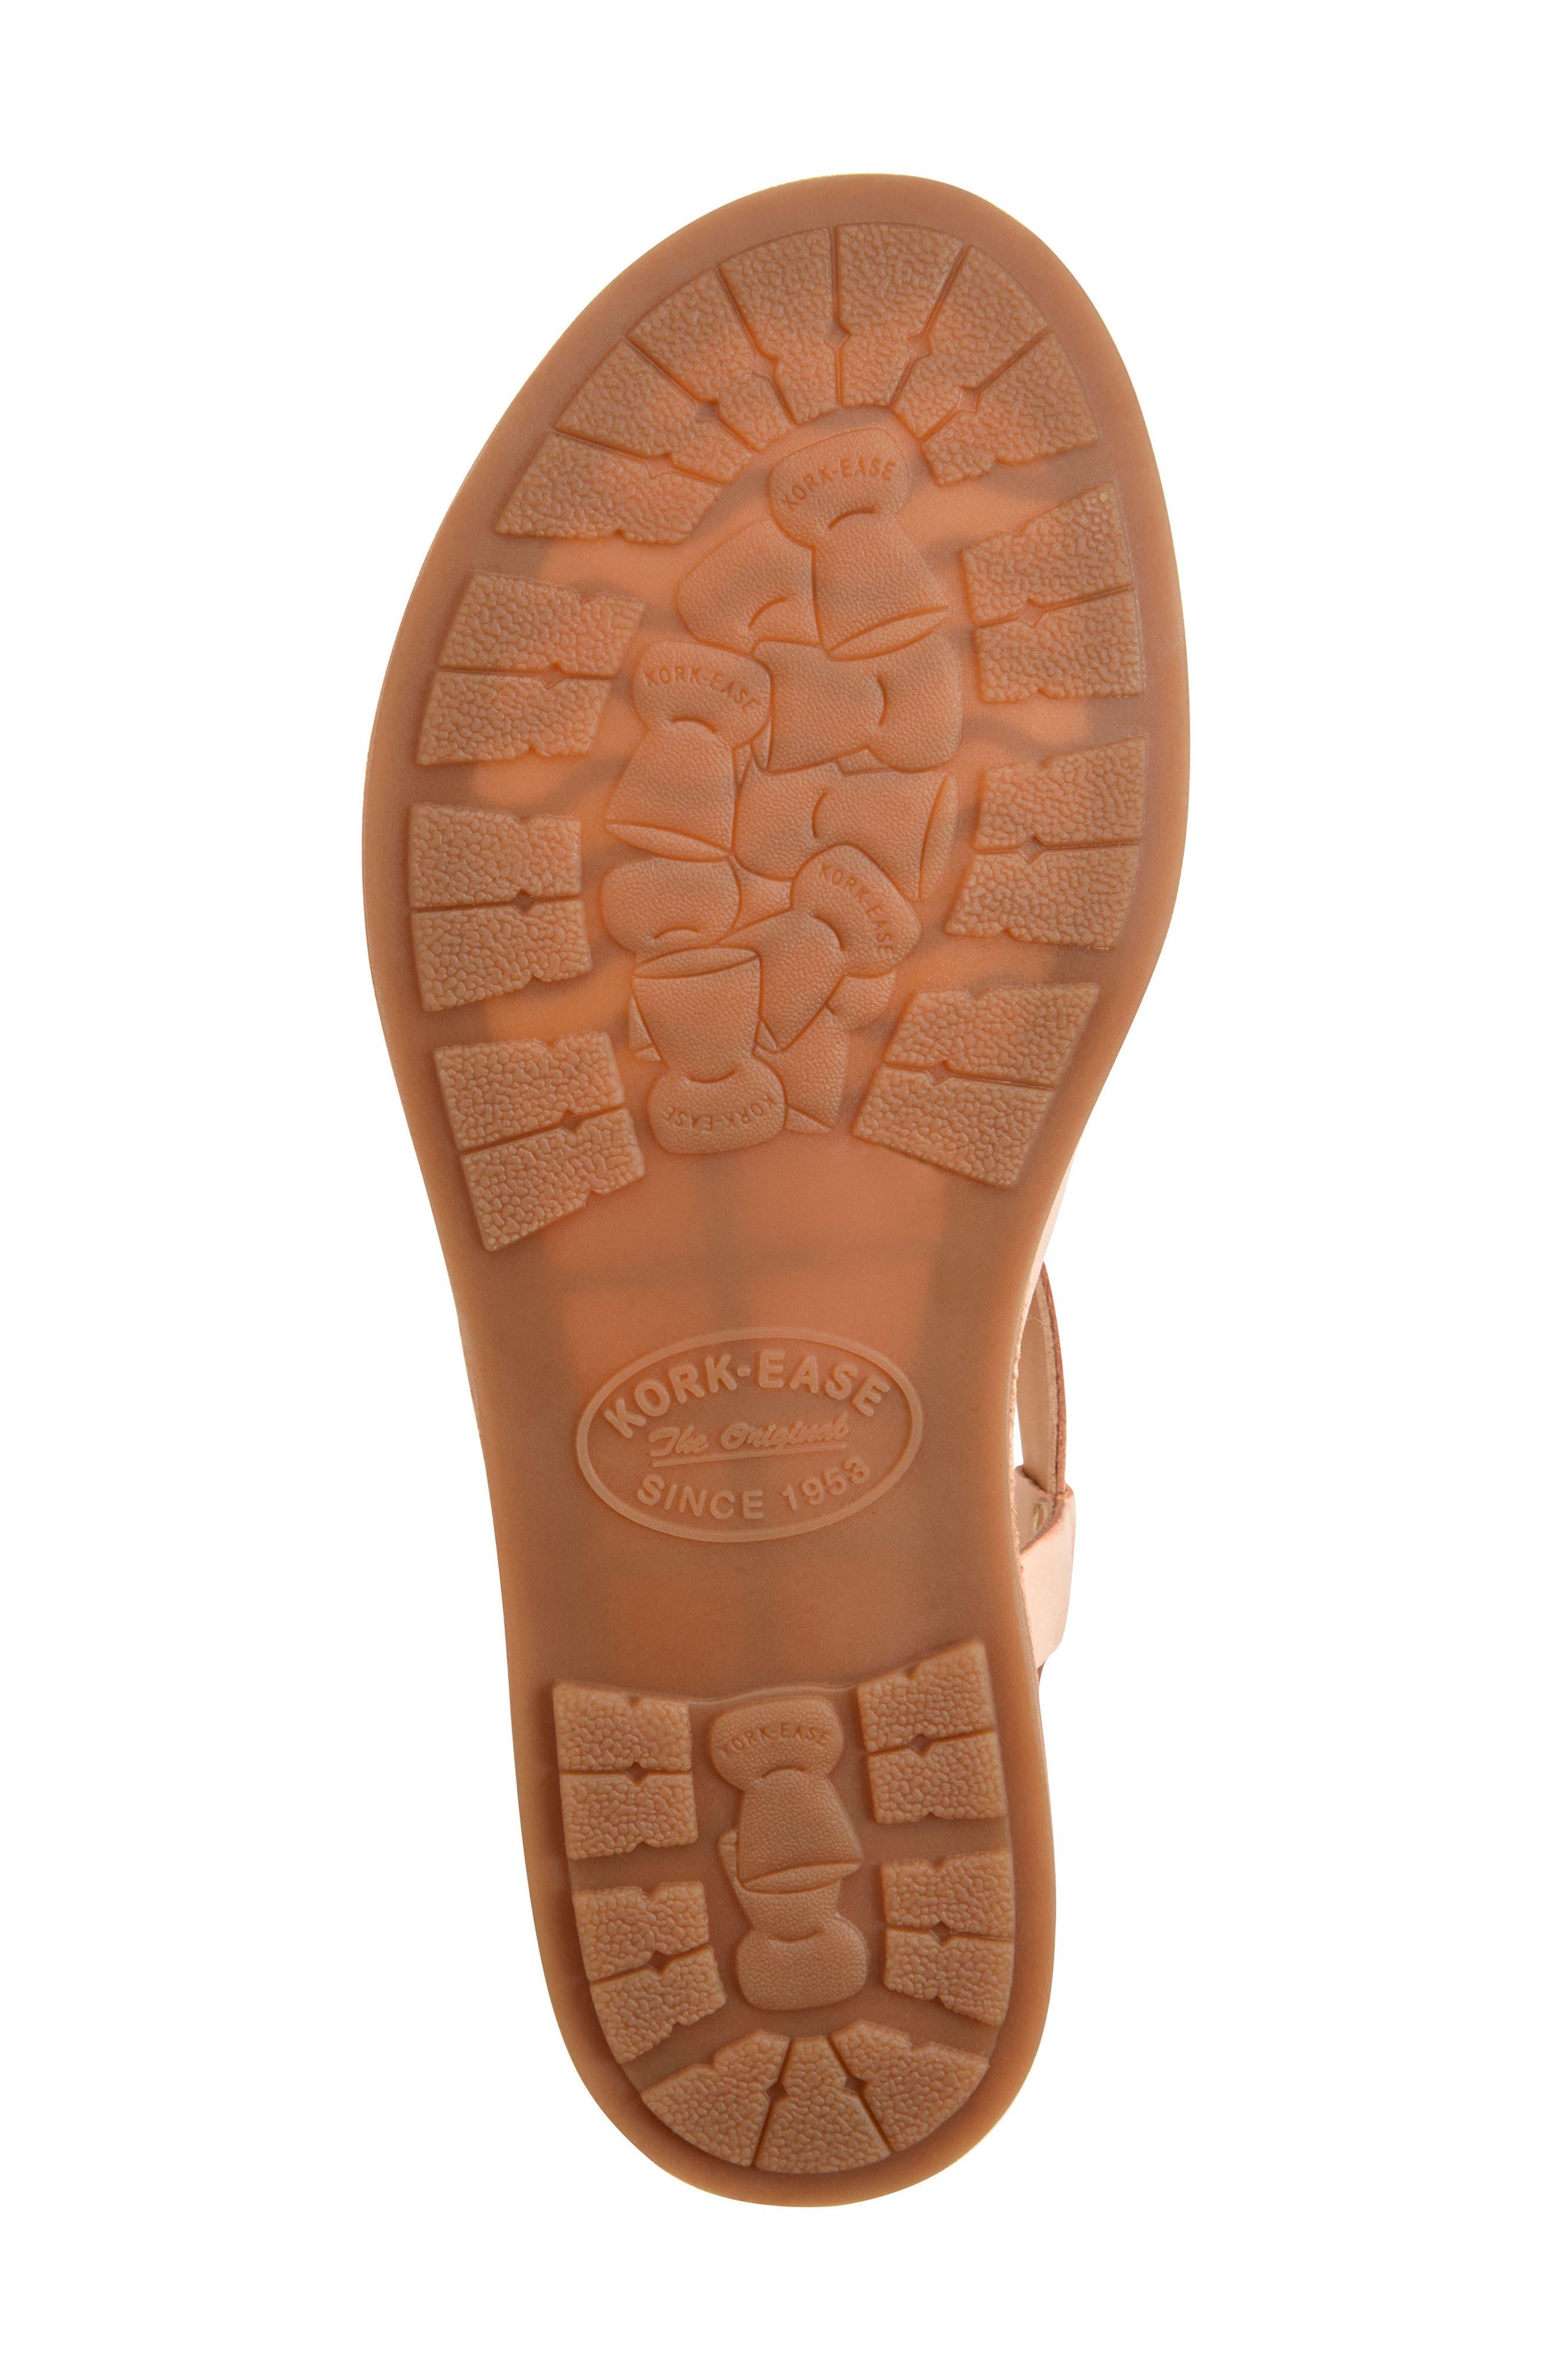 Yarbrough Sandal,                             Alternate thumbnail 6, color,                             Blush Leather